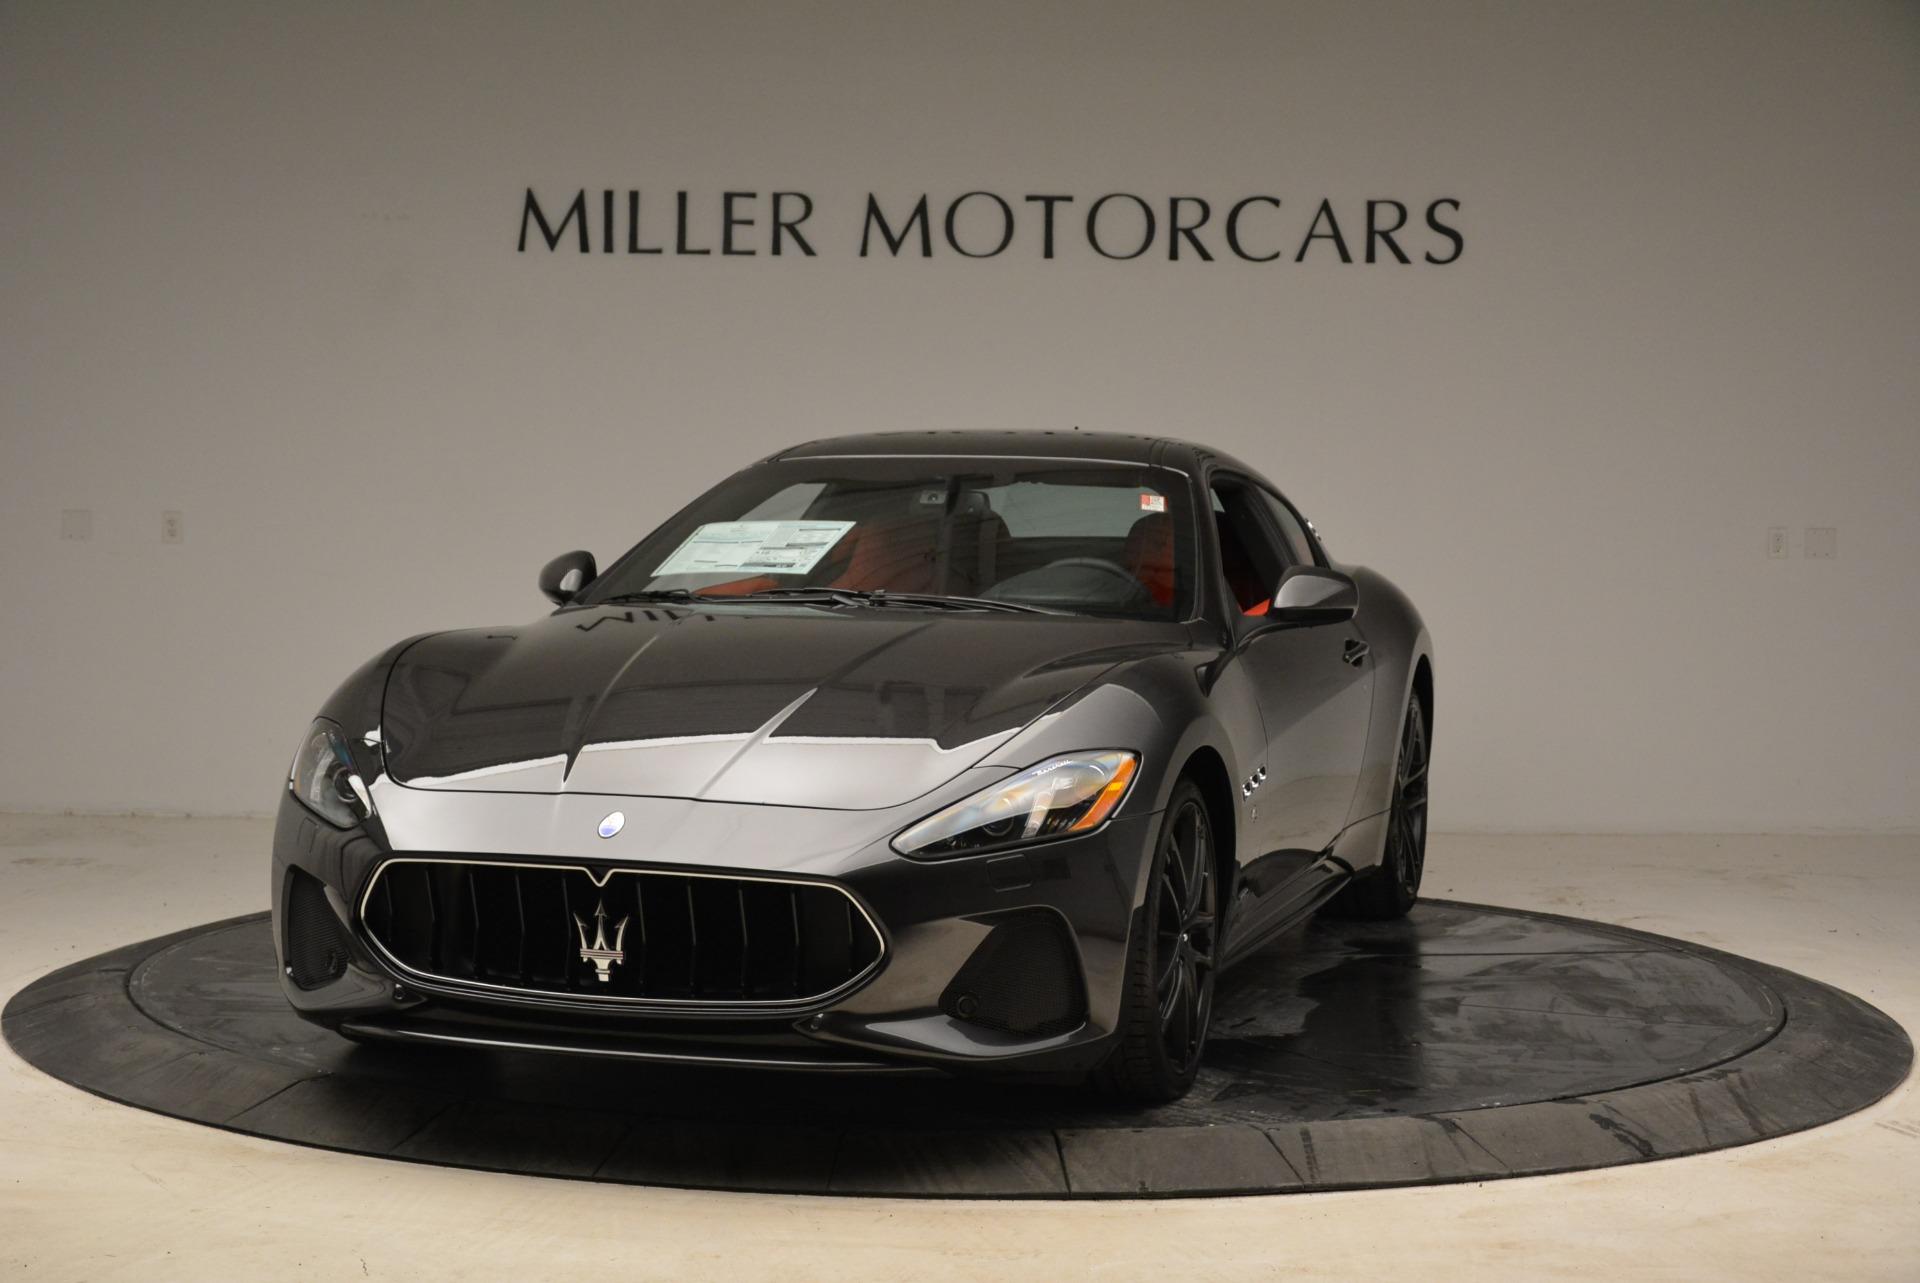 New 2018 Maserati GranTurismo Sport For Sale In Westport, CT 2426_main